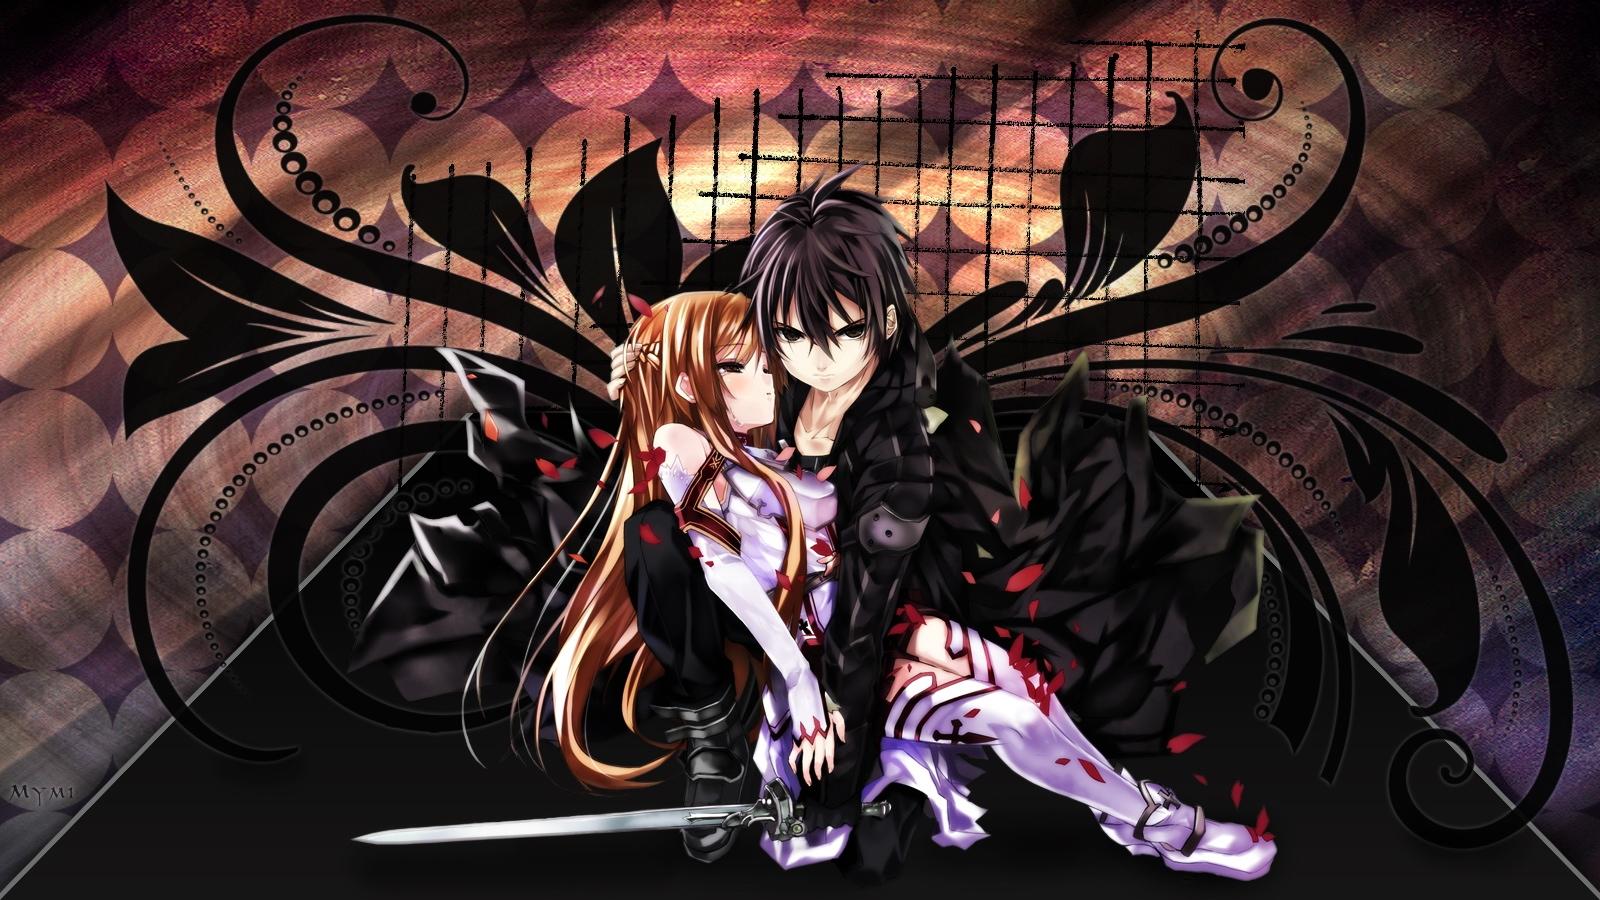 Sword Art Online Wallpaper 1600x900 wallpaperhere 1600x900